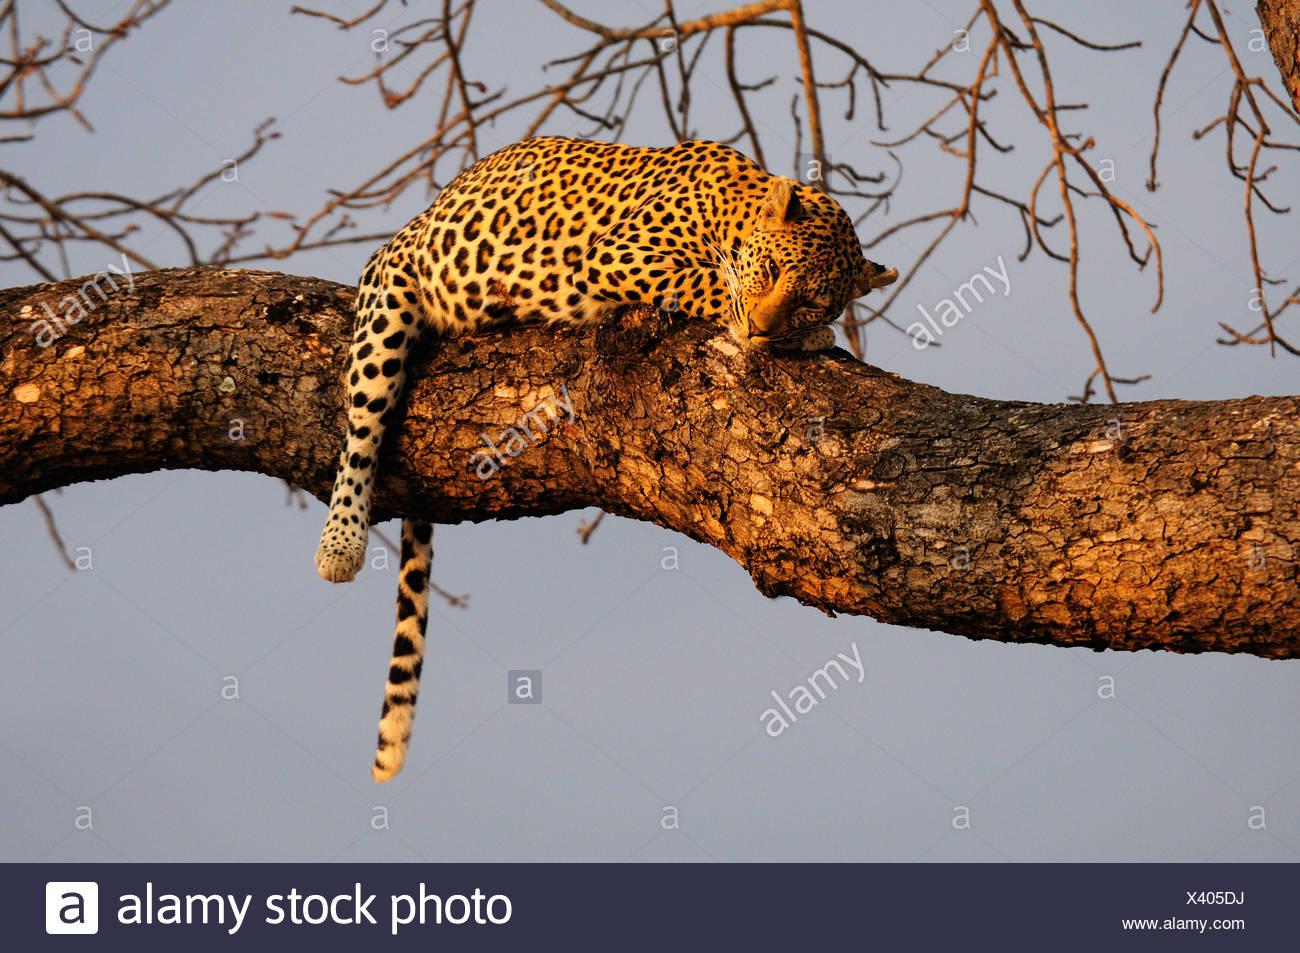 Leopard Panthera pardus Ulusaba Sir Richard Branson's Private Game Reserve Sabi Sands Game Reserve Mpumalanga South Africa cat - Stock Image